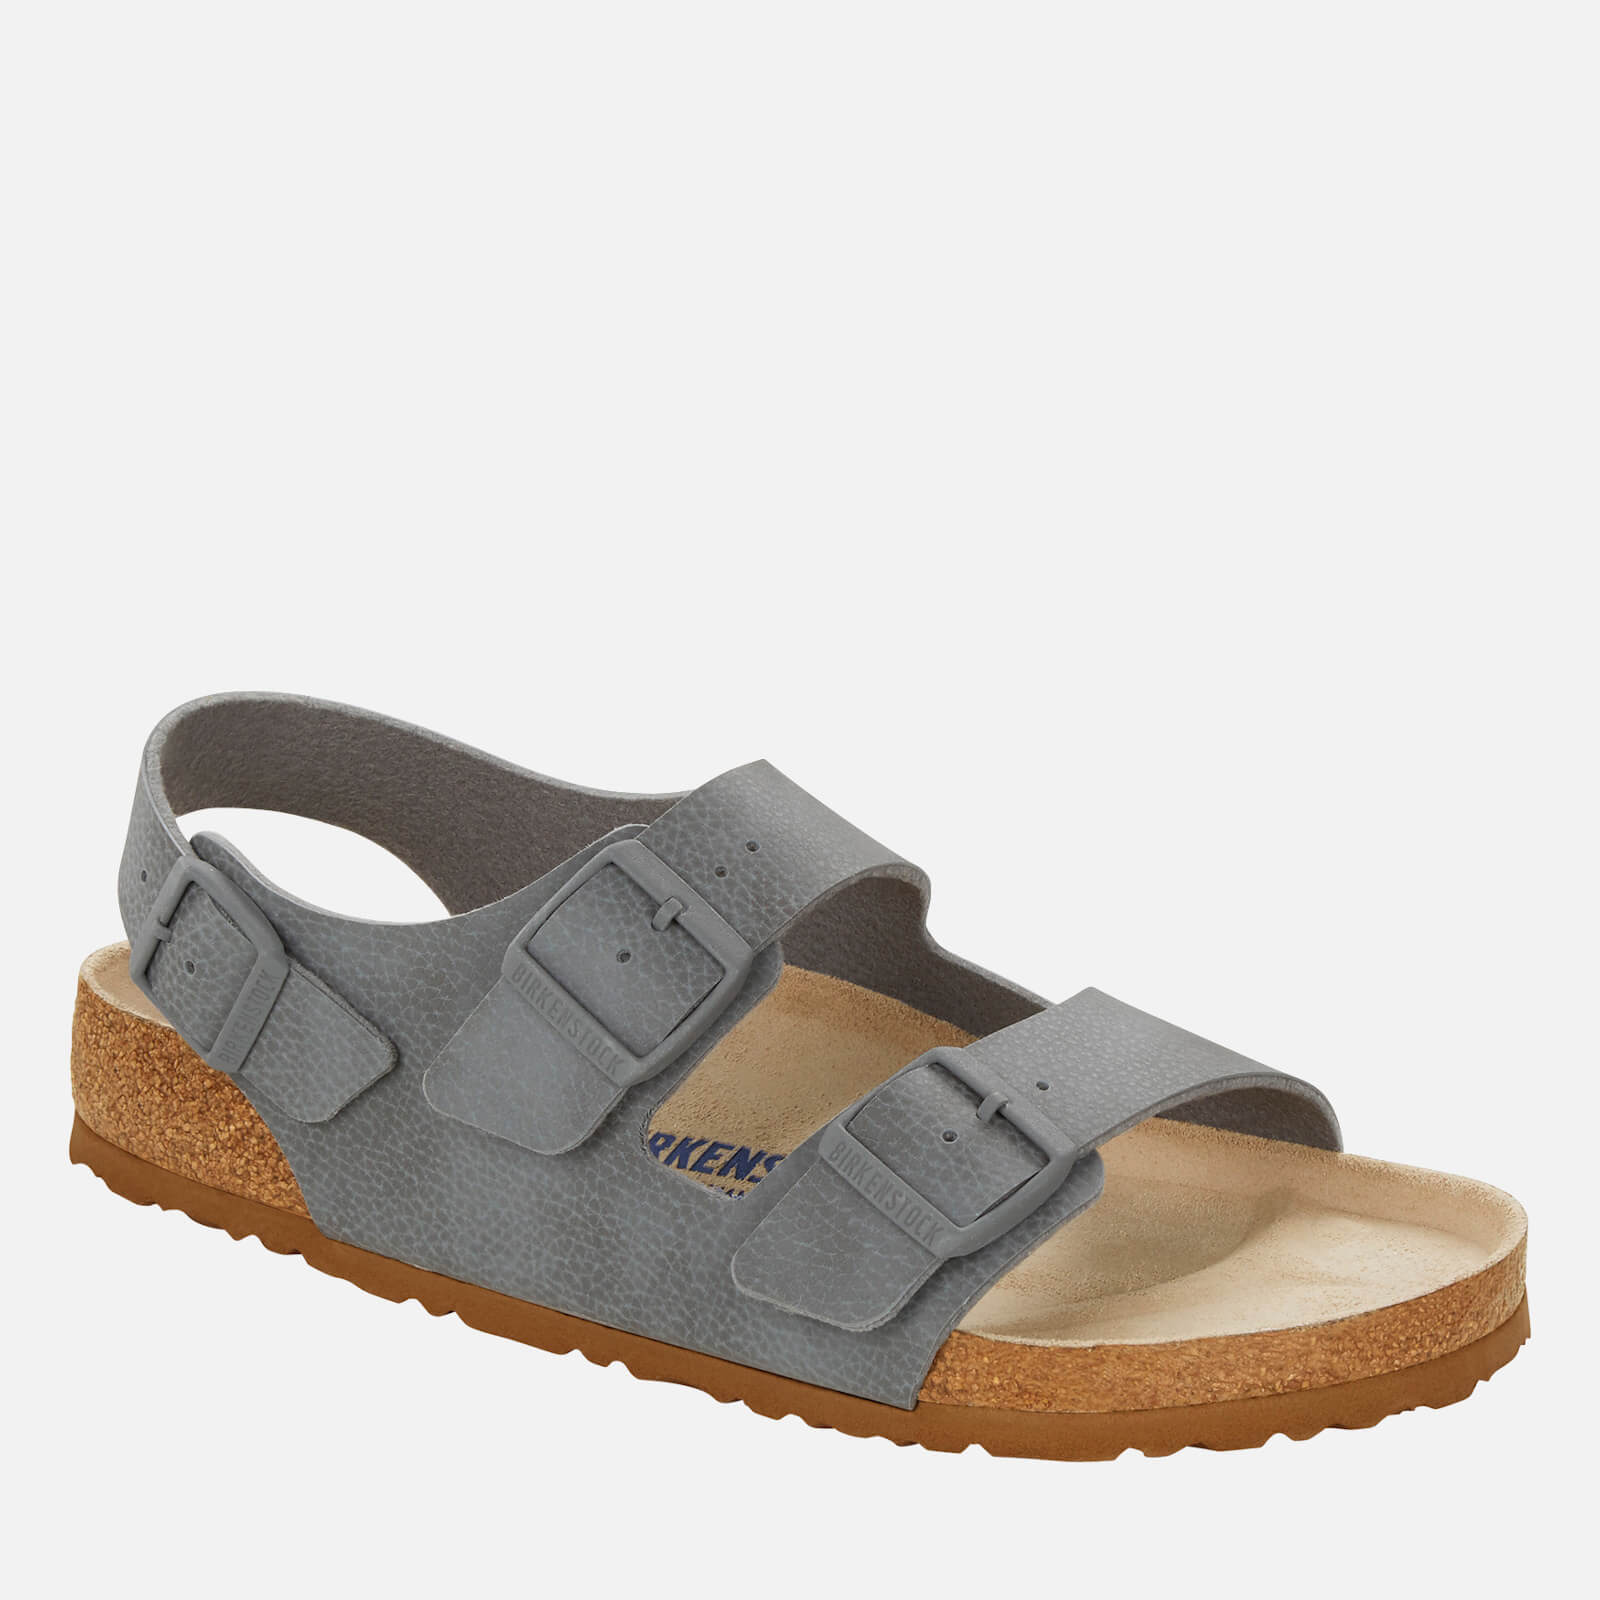 Birkenstock Mens Milano Double Strap Sandals Desert Soil Grey Eu 43 Uk 9